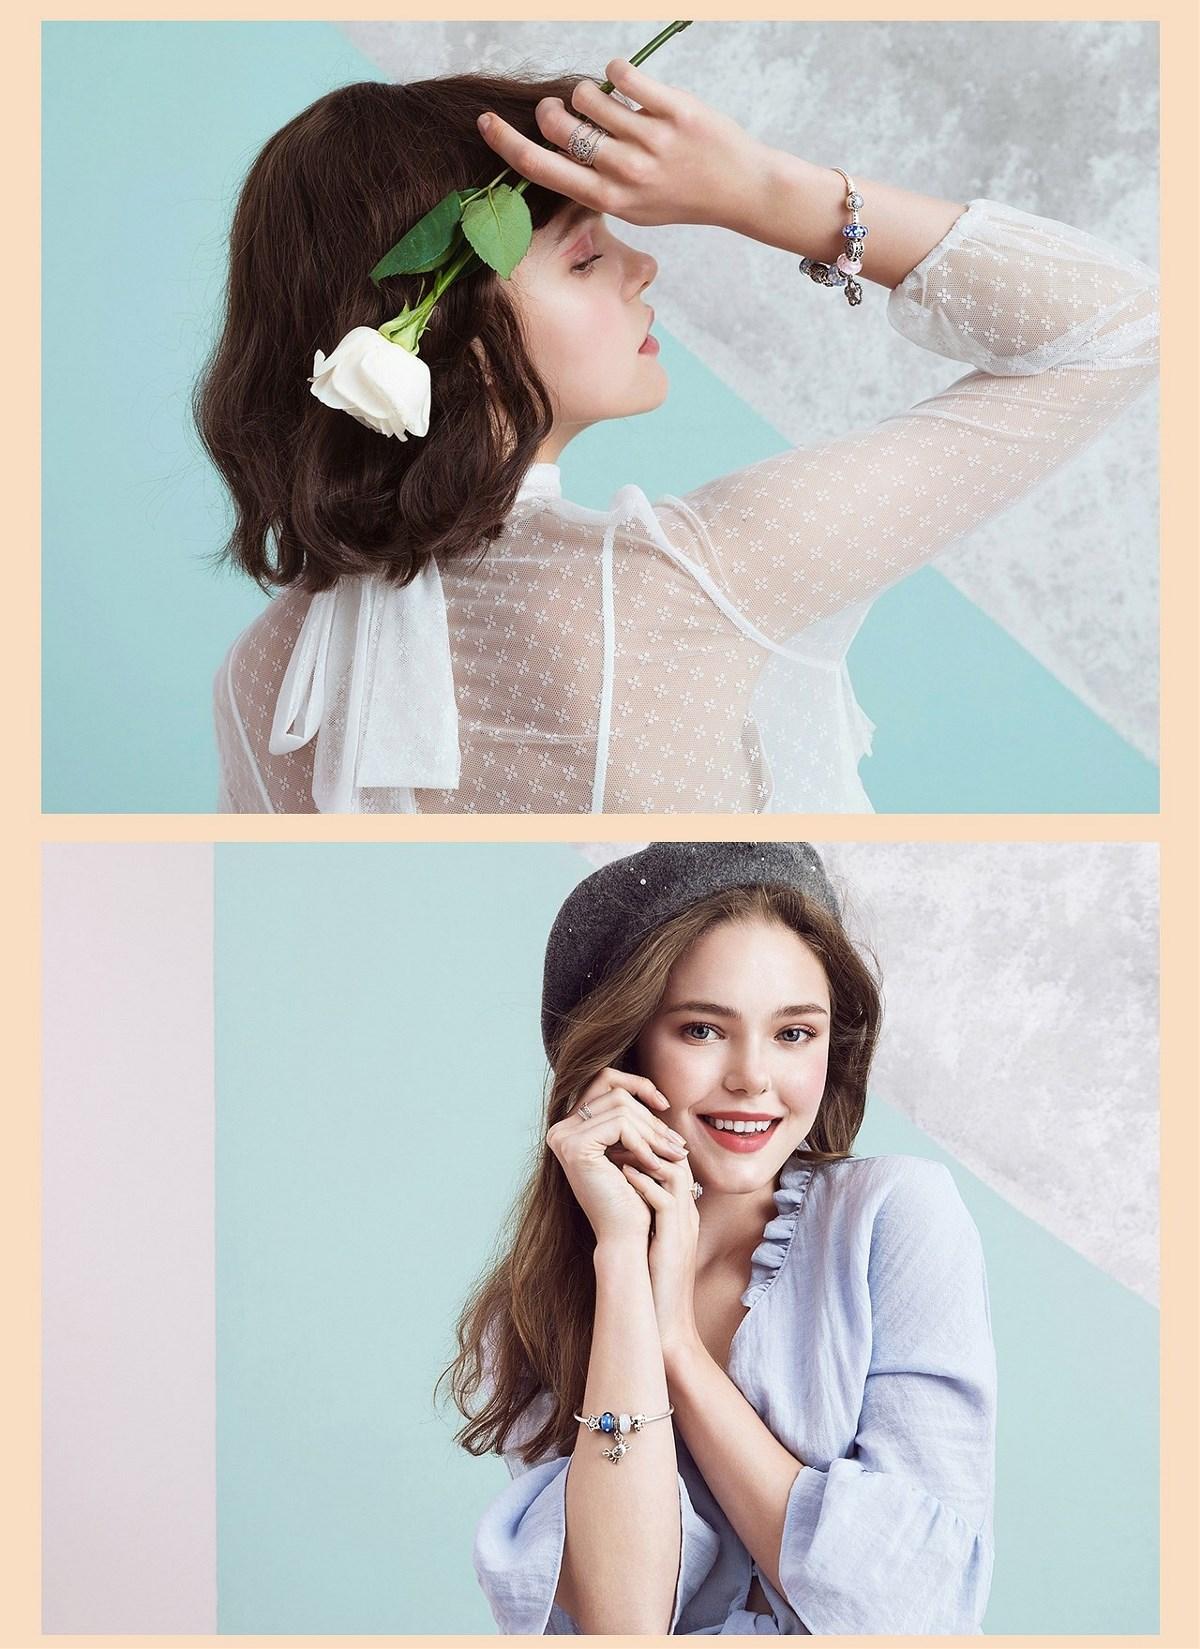 Beauty Charm-珠宝【汤臣杰逊】